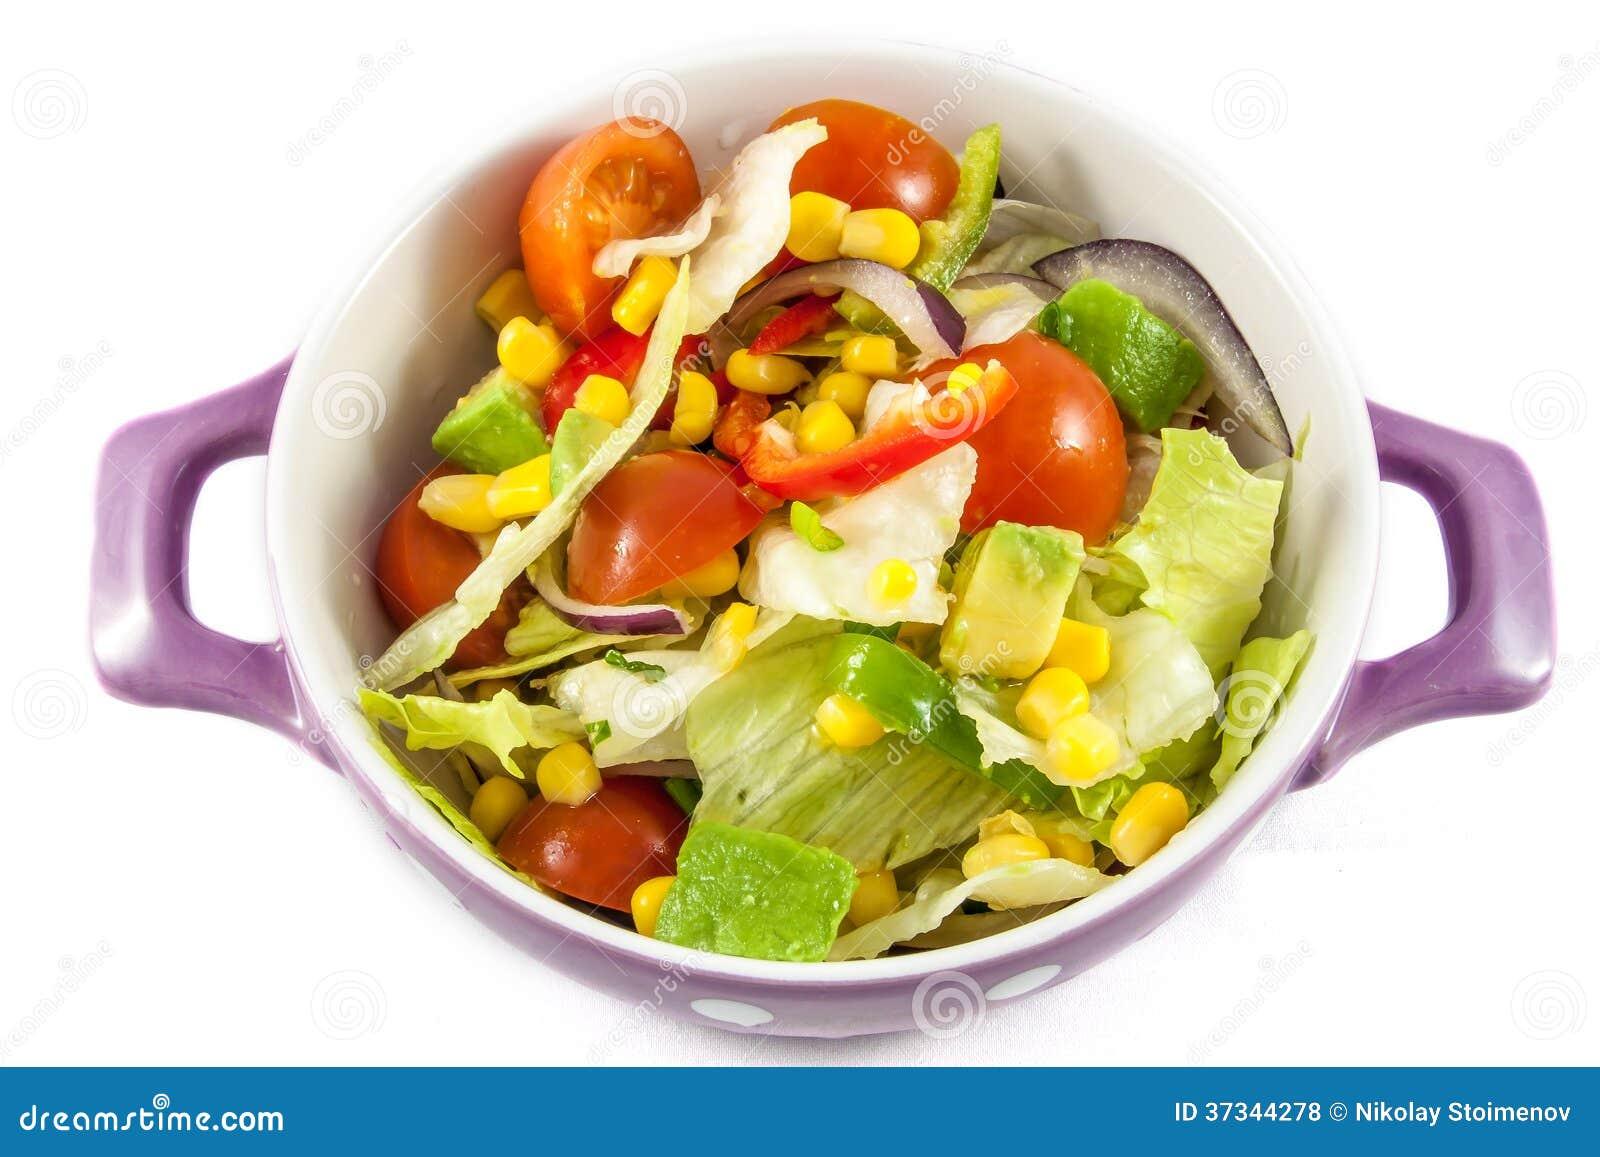 Cherry tomatoes and iceberg lettuce salad